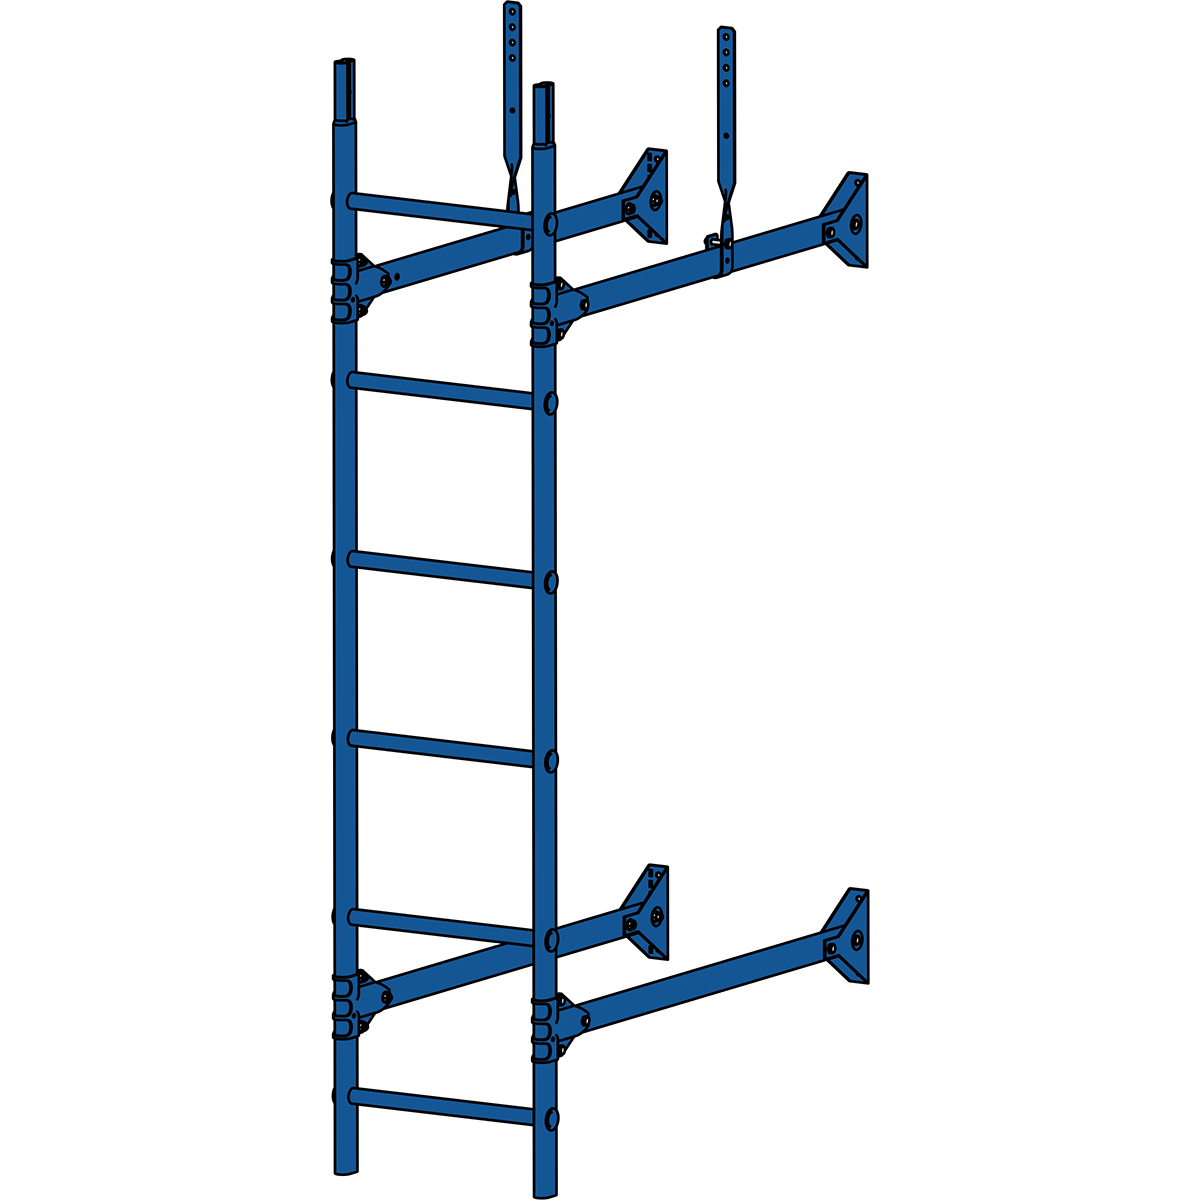 Лестница стеновая ROOFSYSTEMS PRESTIGE ZN 1,2 м RAL 5005 Синий насыщенный